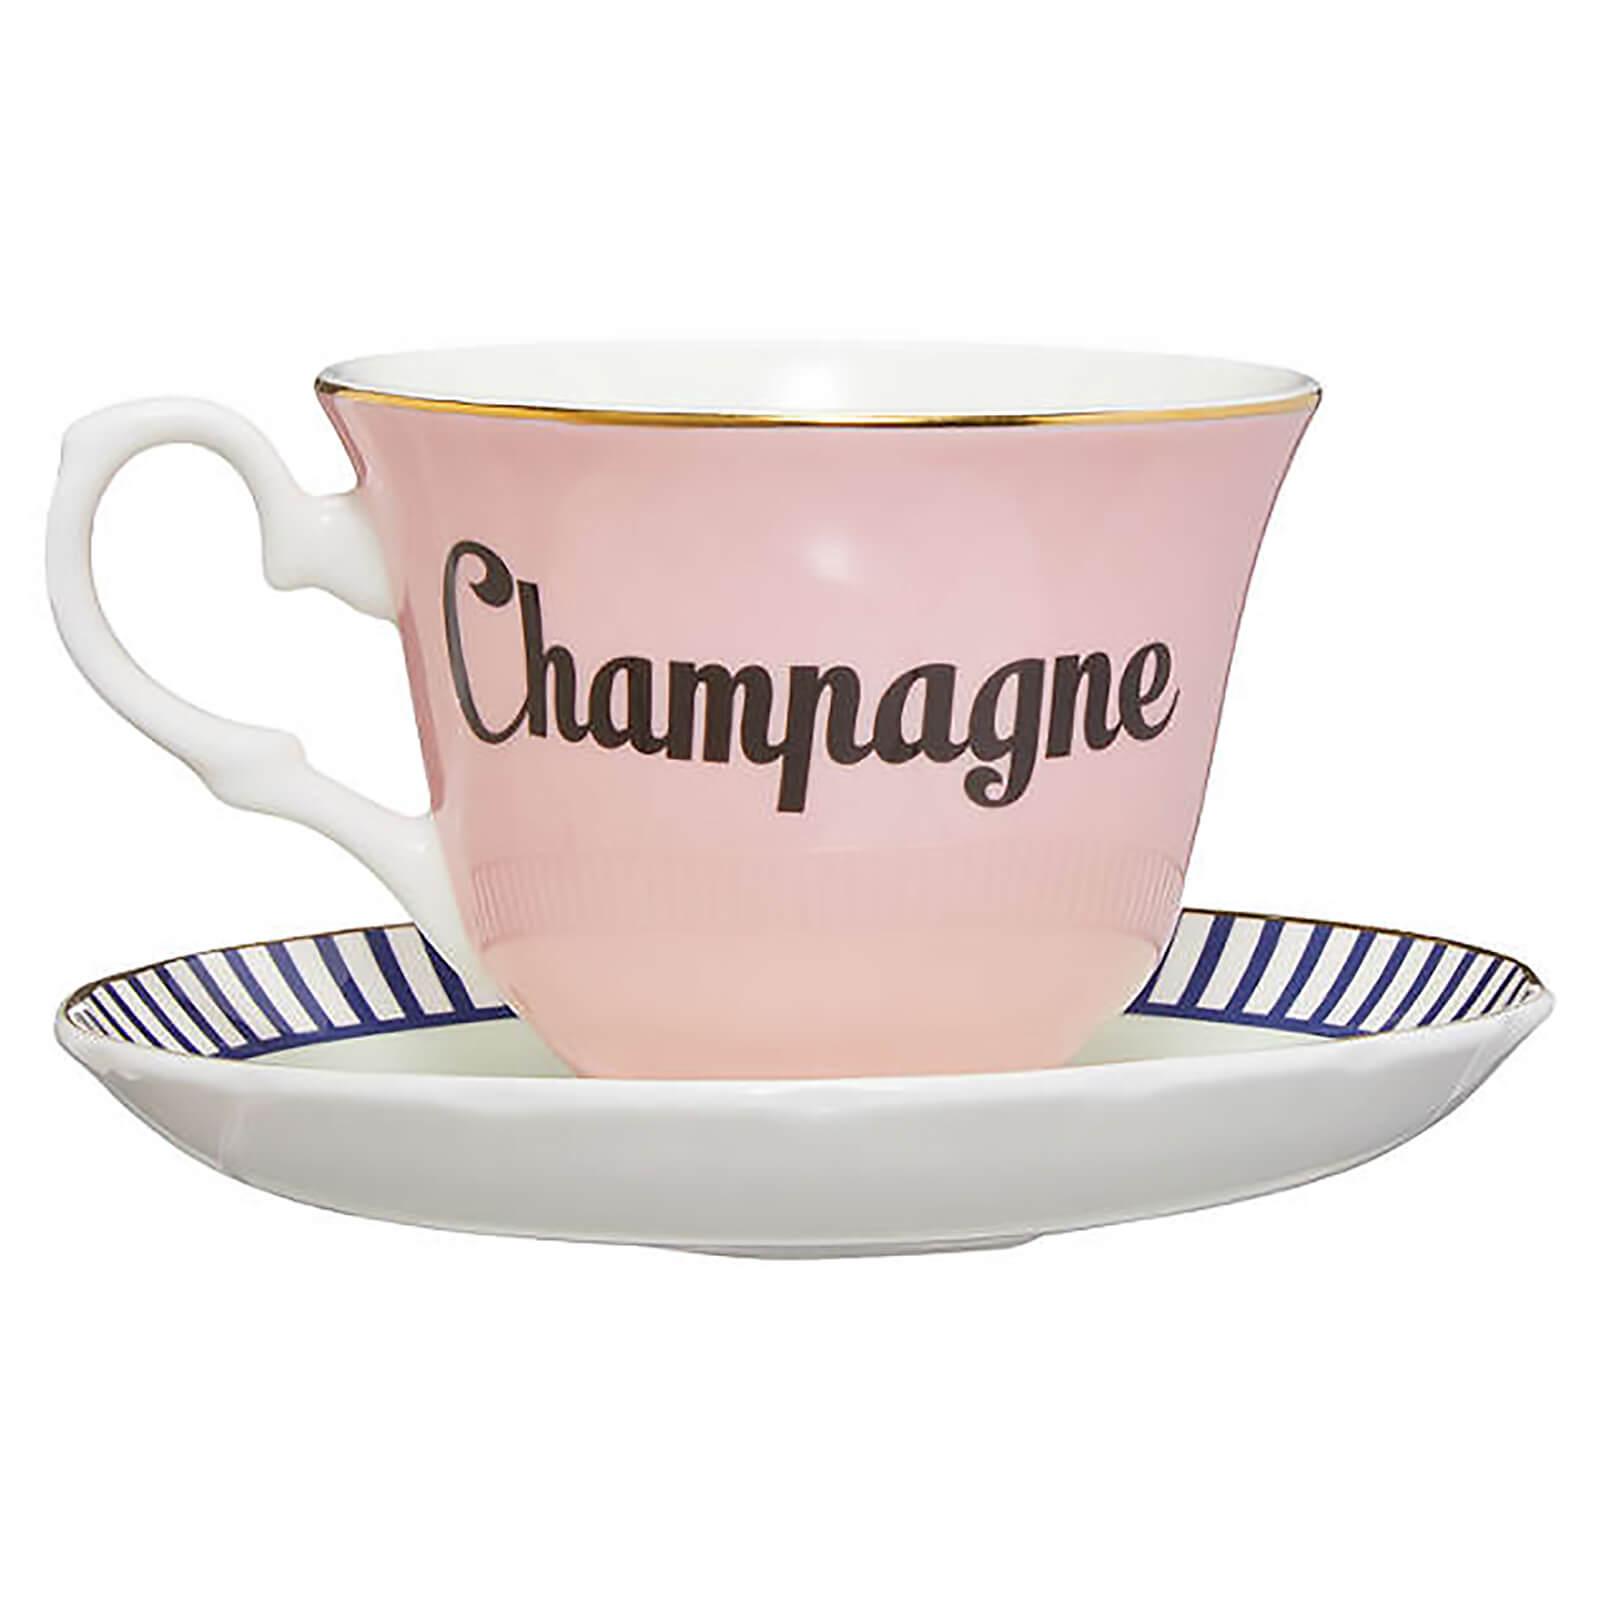 Yvonne Ellen Champagne Teacup and Saucer - Pink